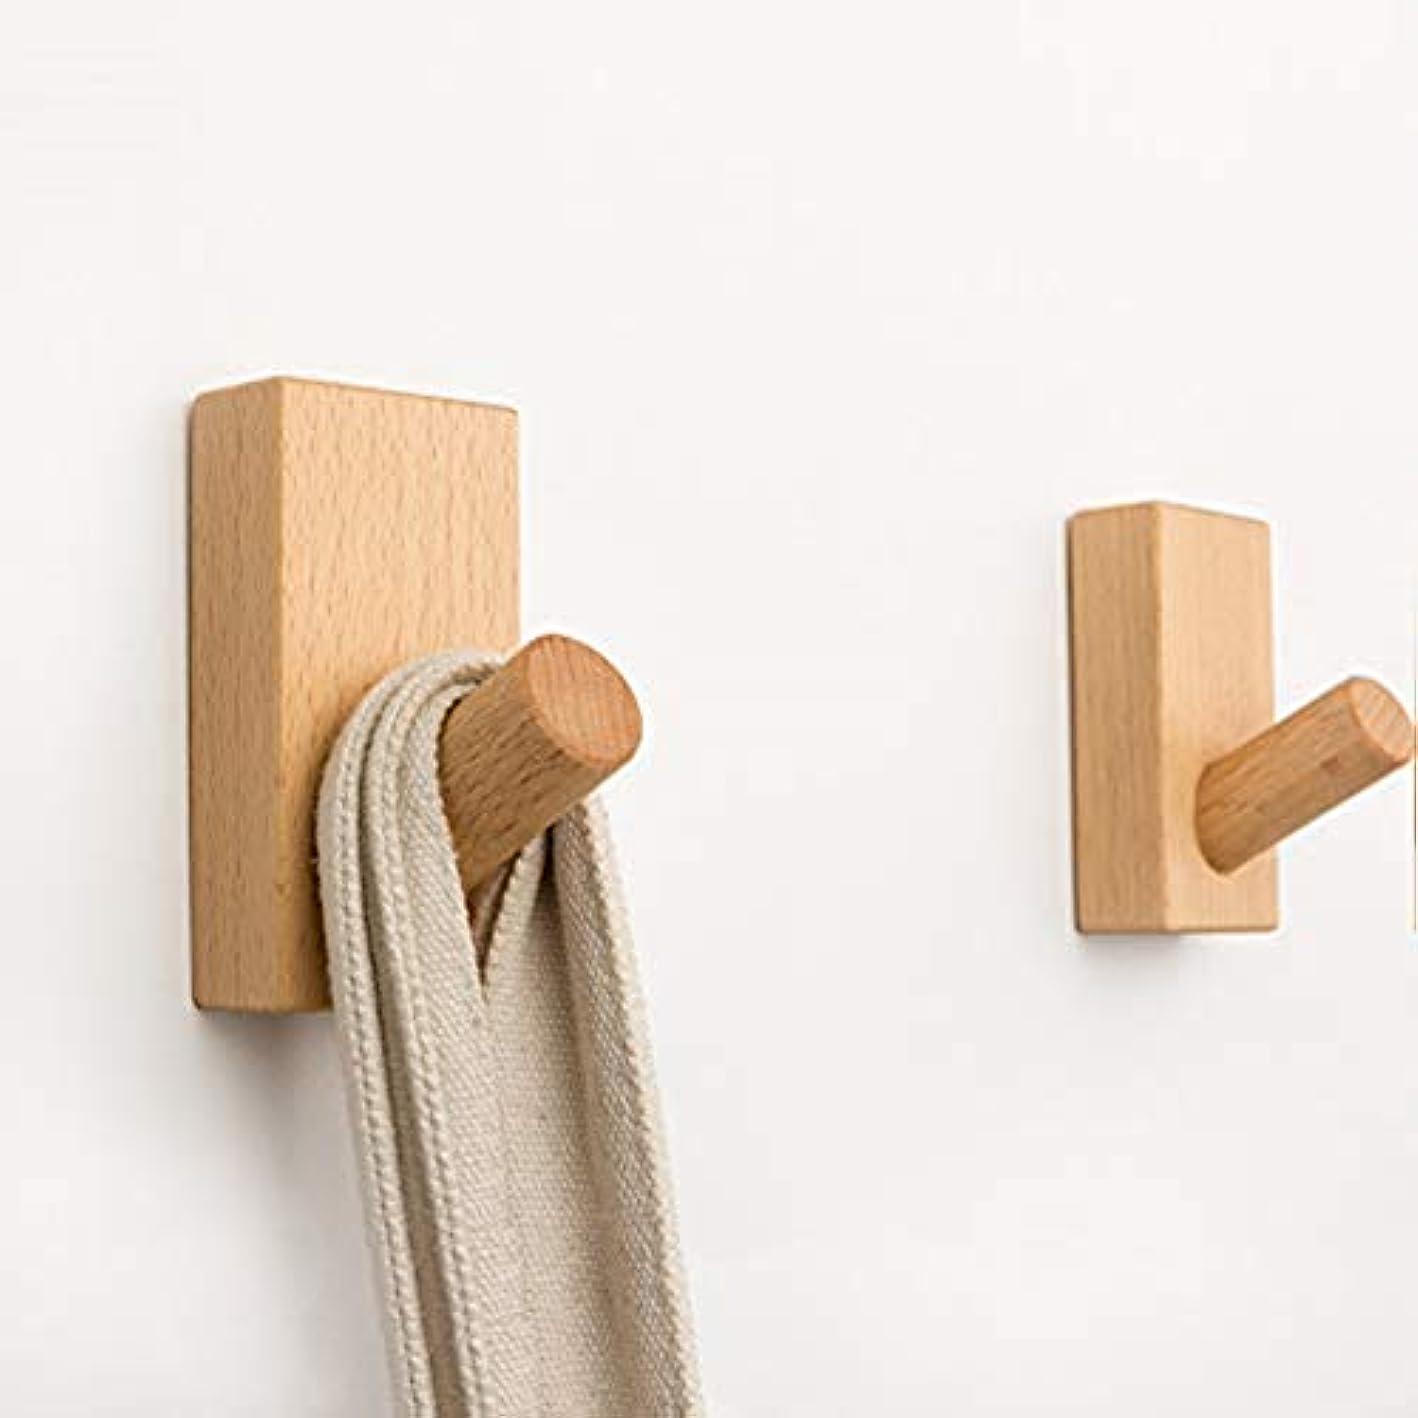 Natural Wooden Coat Hooks Wall Mounted - Vintage Single Organizer Hangers, Handmade Craft Hat Rack (Beech Wood,2pcs)